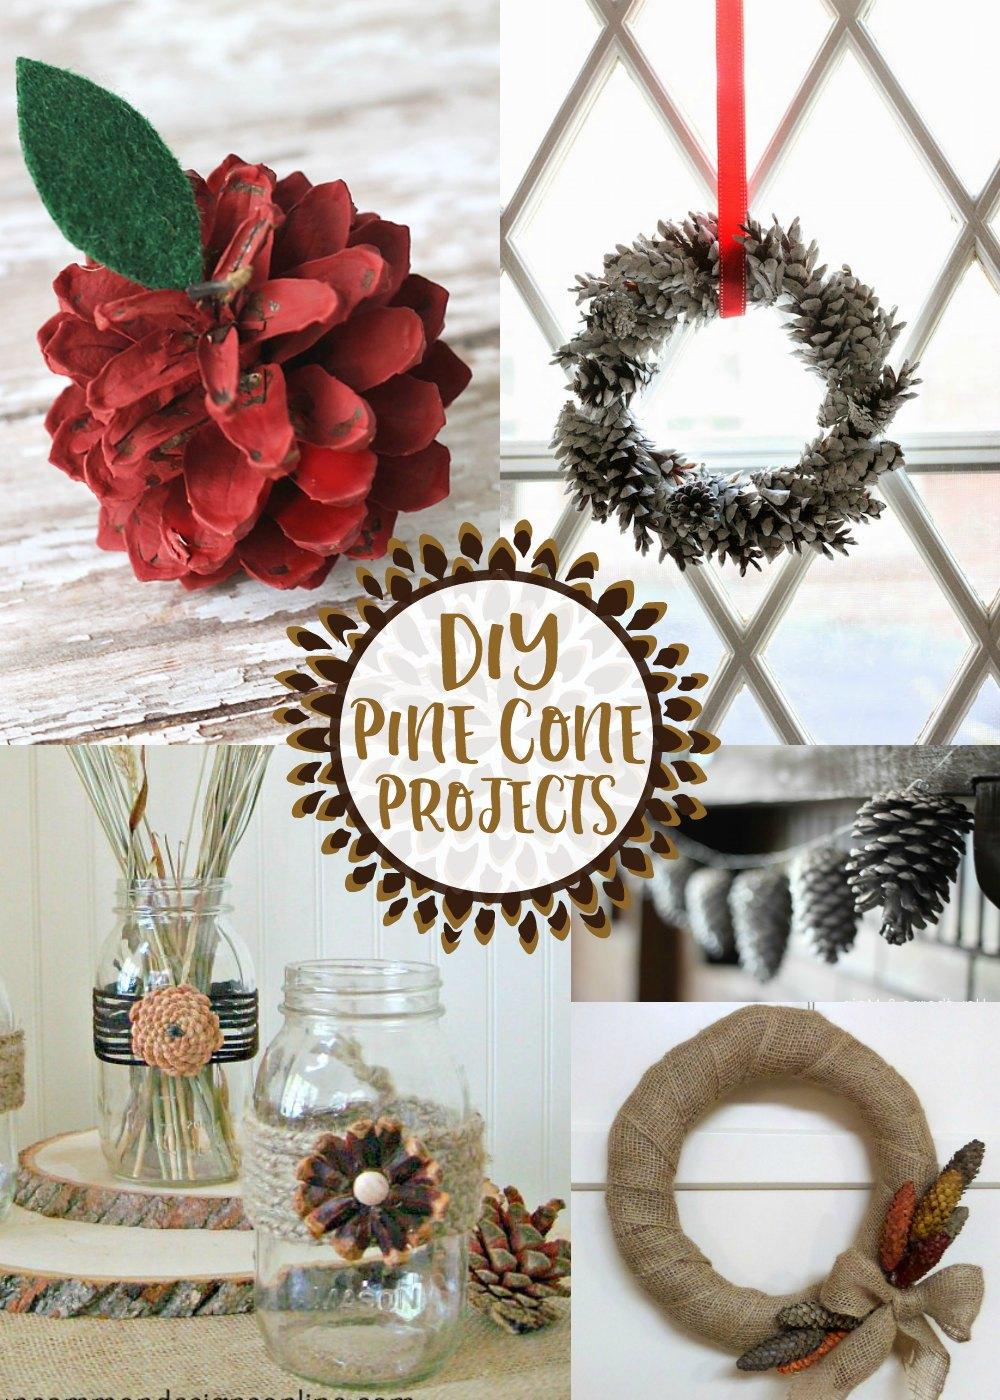 Elegant DIY Pin Cone Projects as seen on jennsRAQ.com